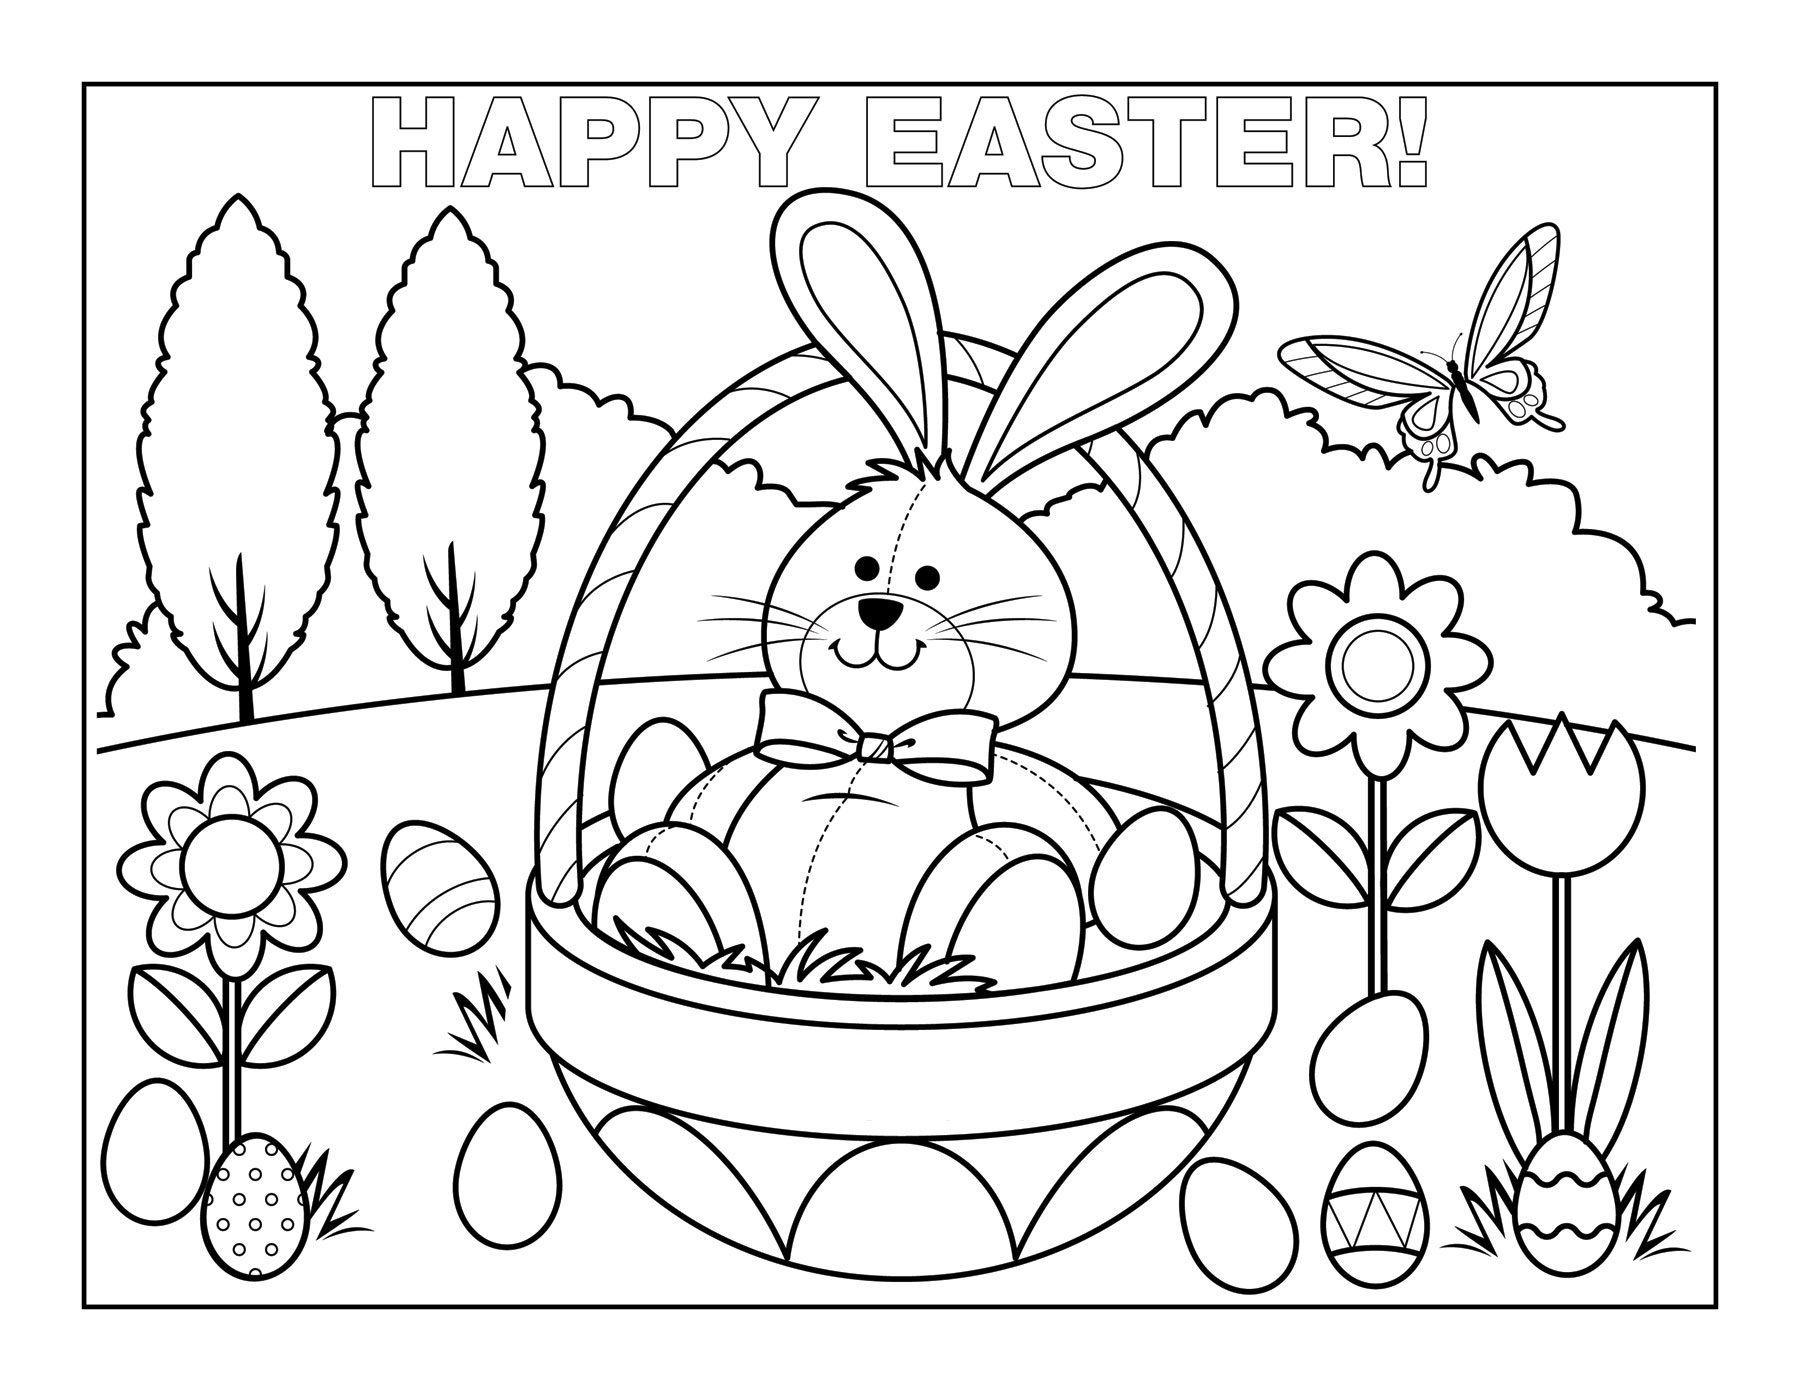 Easter-Egg-Basket-Coloring-Pages (21).jpg (1800×1391) | Coloring ...